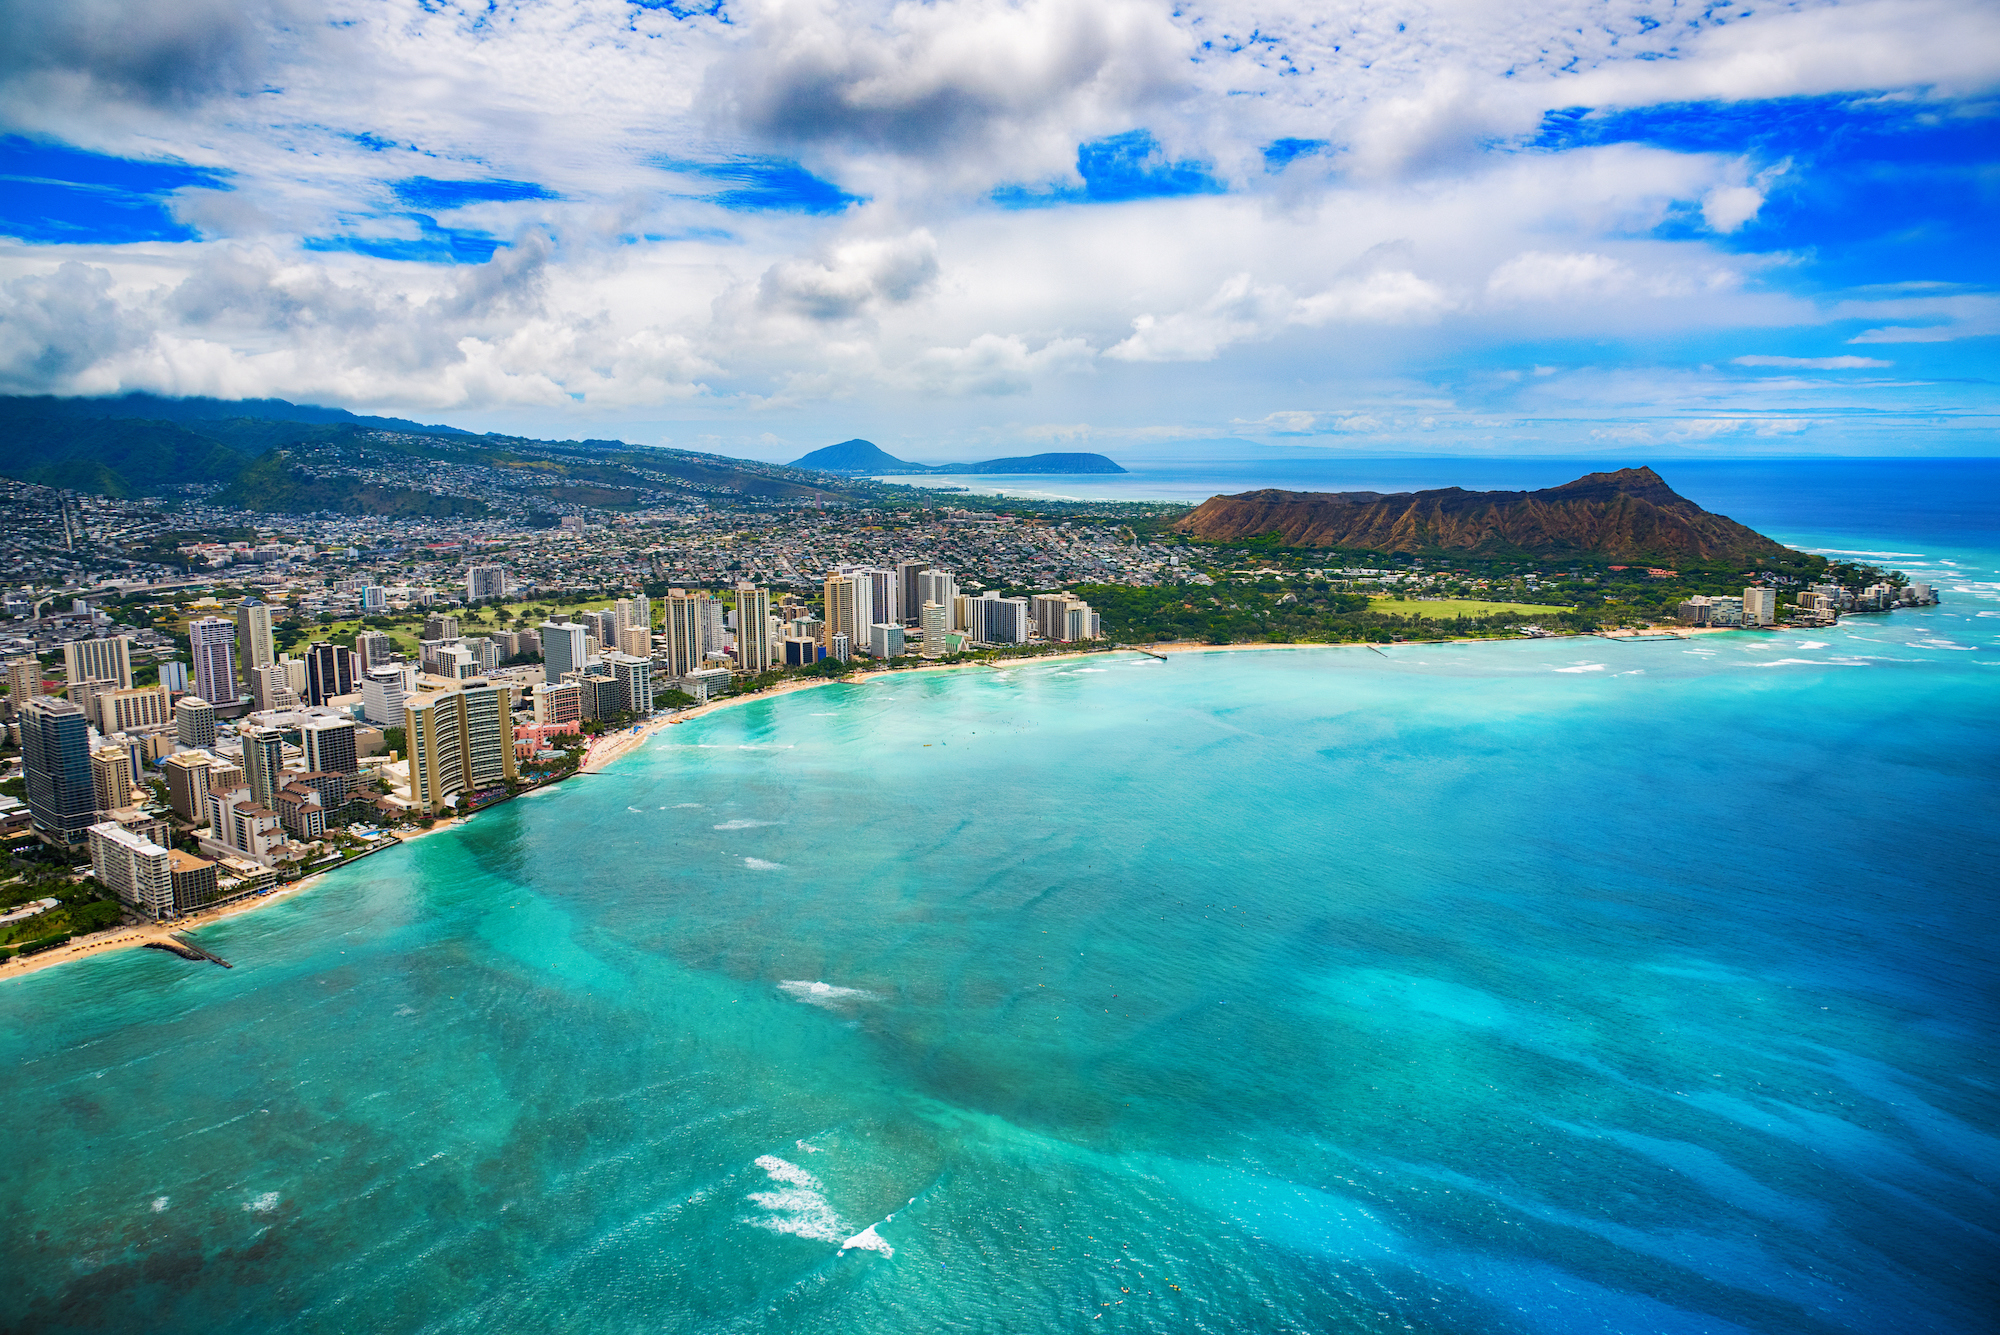 Hawai'i Tourism Oceania to host first MICE roadshow since 2016